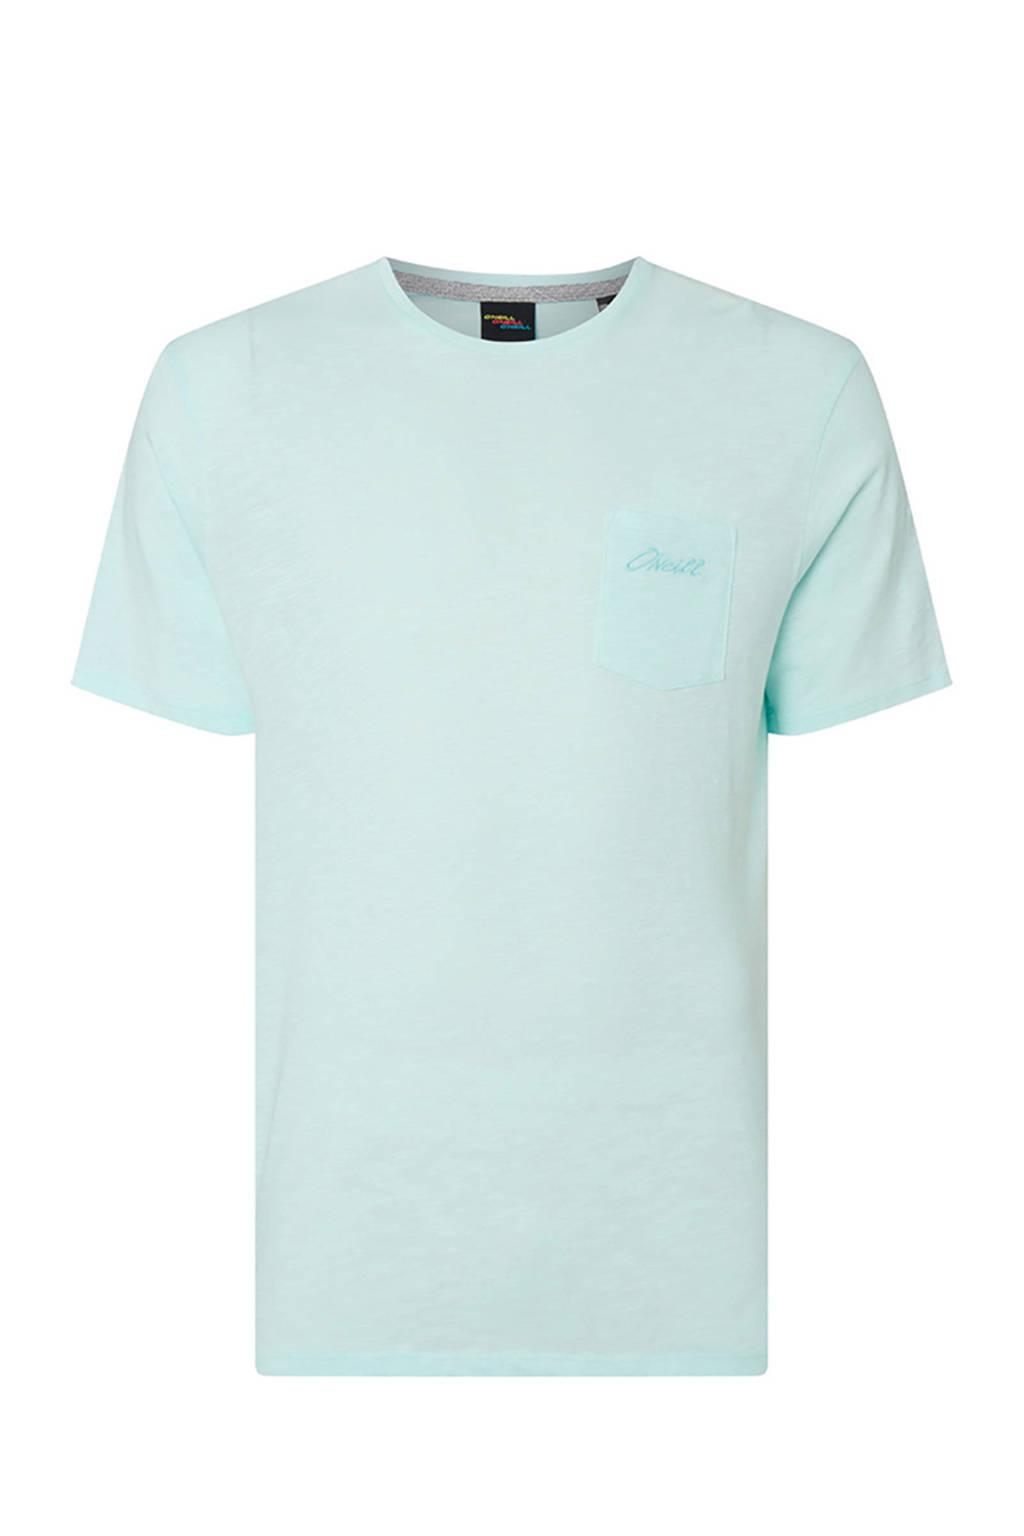 O'Neill gemêleerd T-shirt van biologisch katoen lichtblauw, Lichtblauw